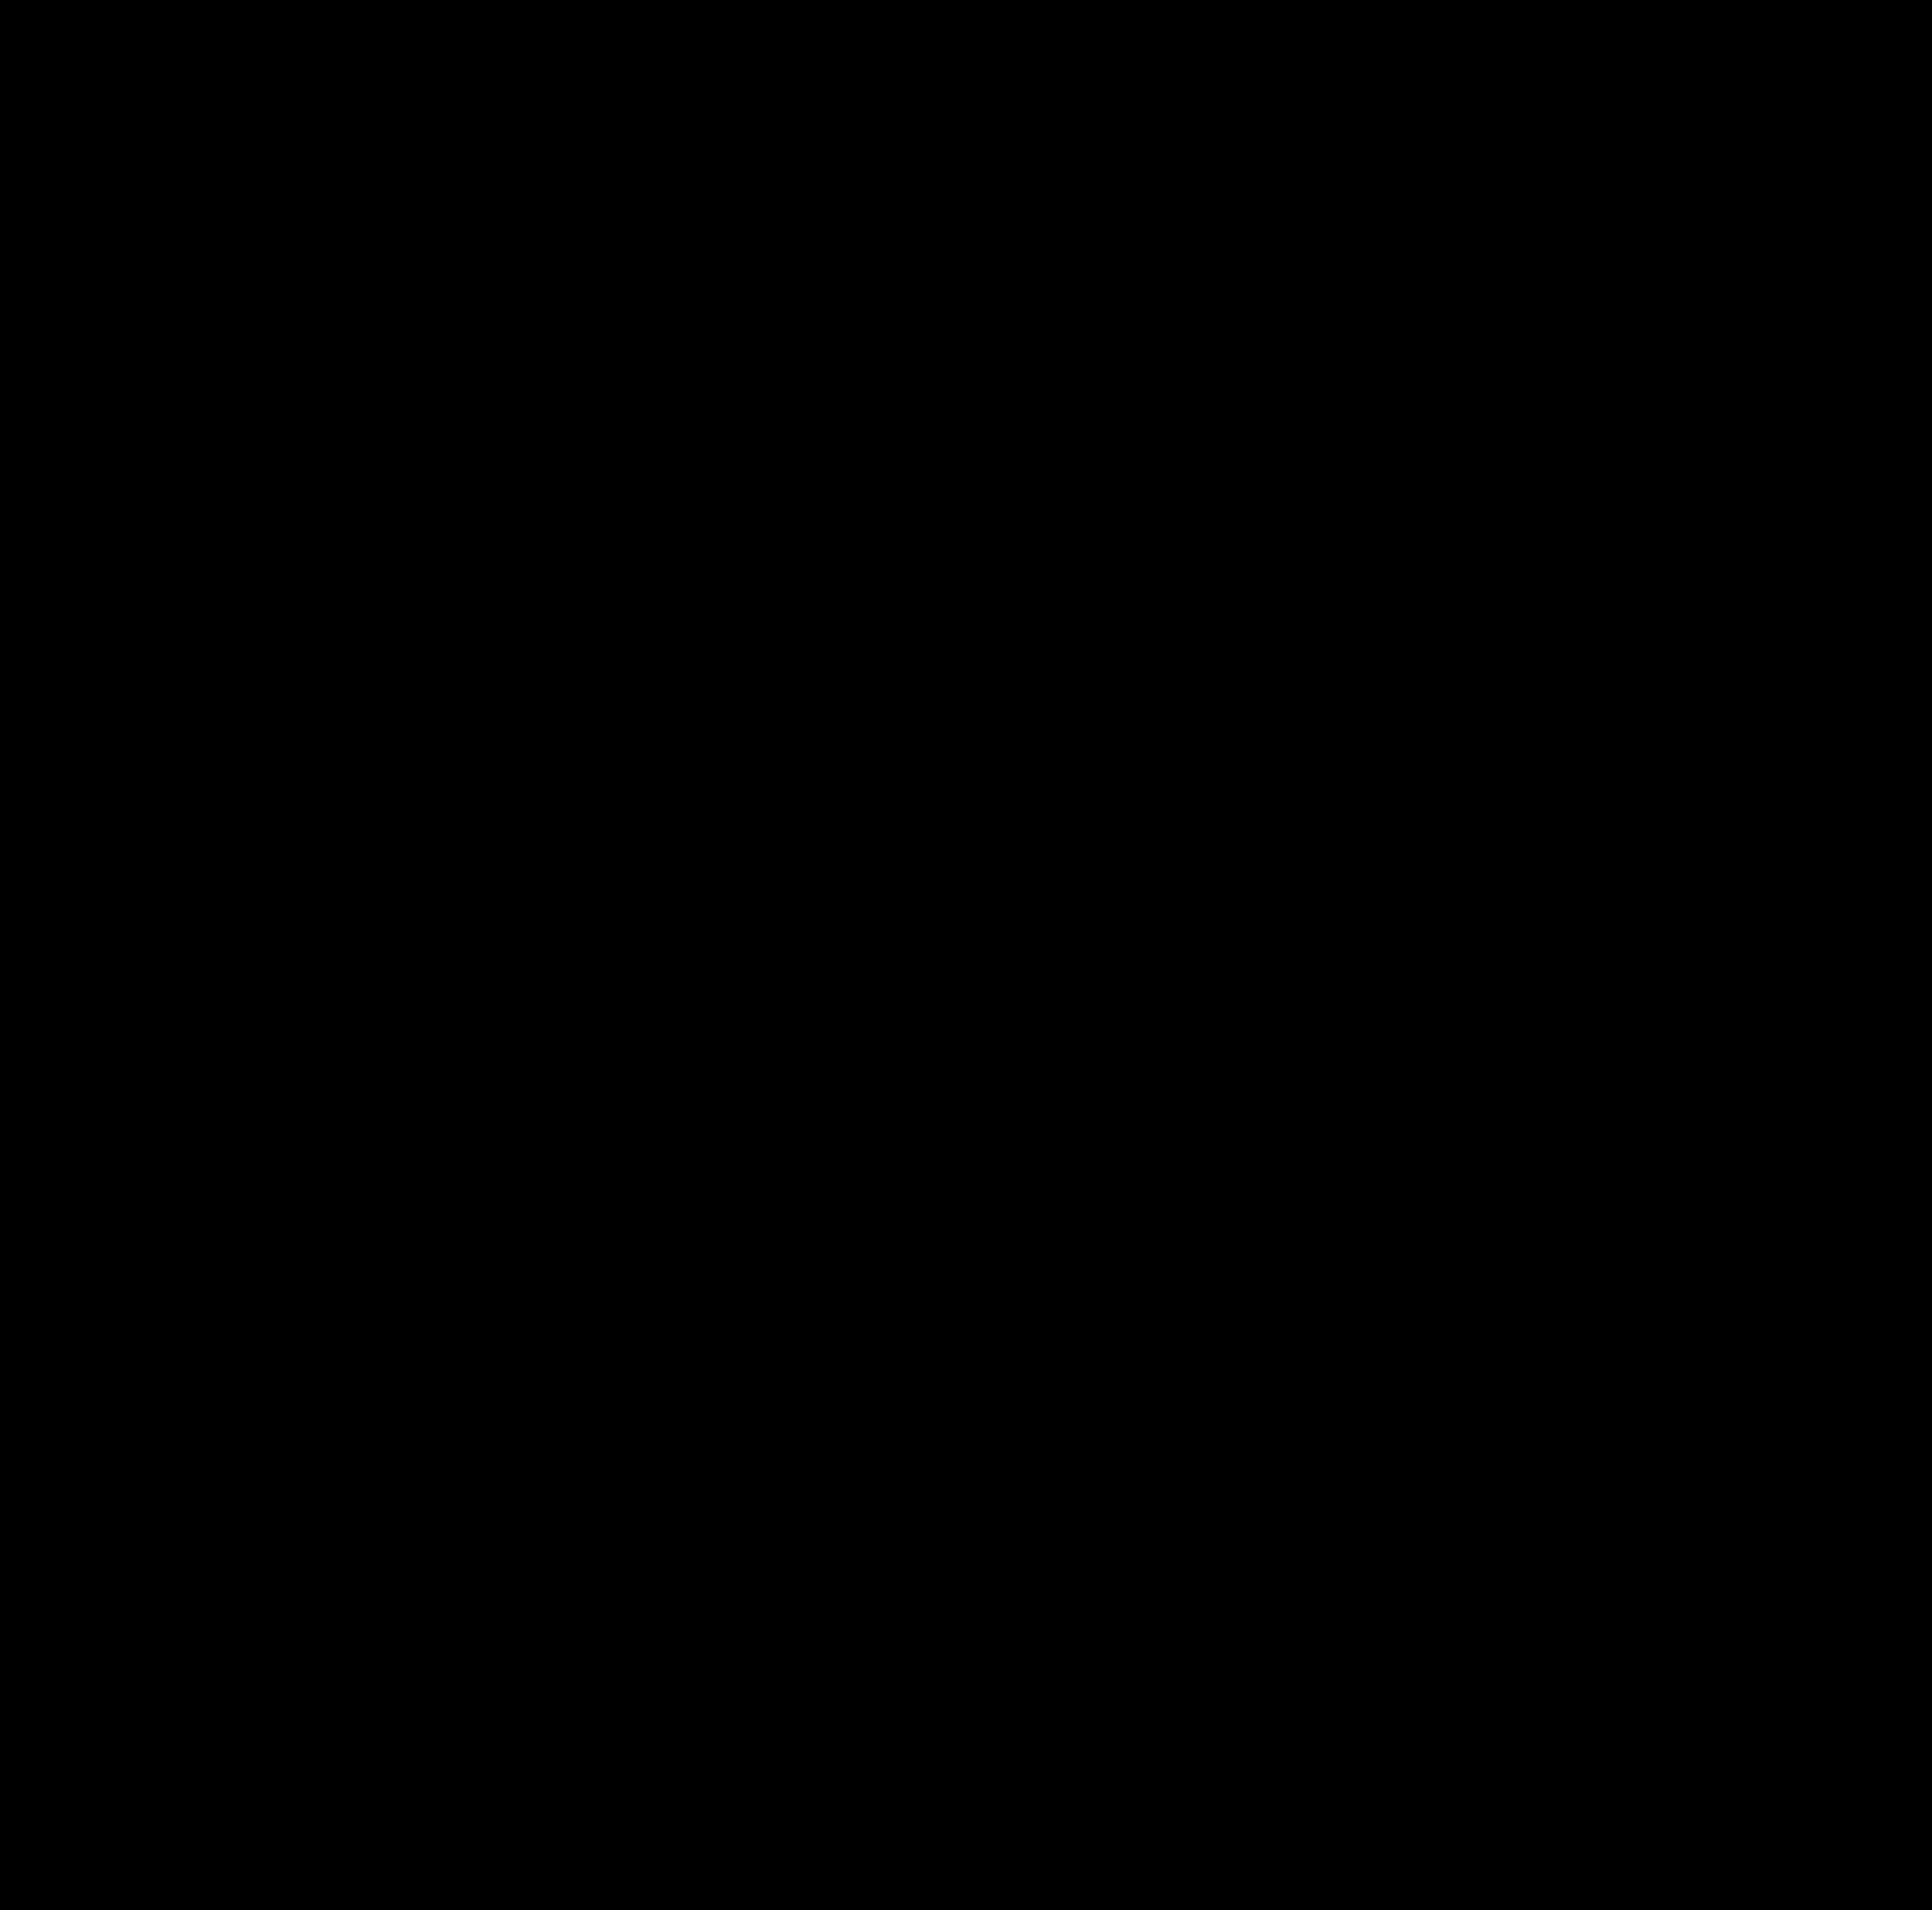 Clipart Triangular Ornament 17